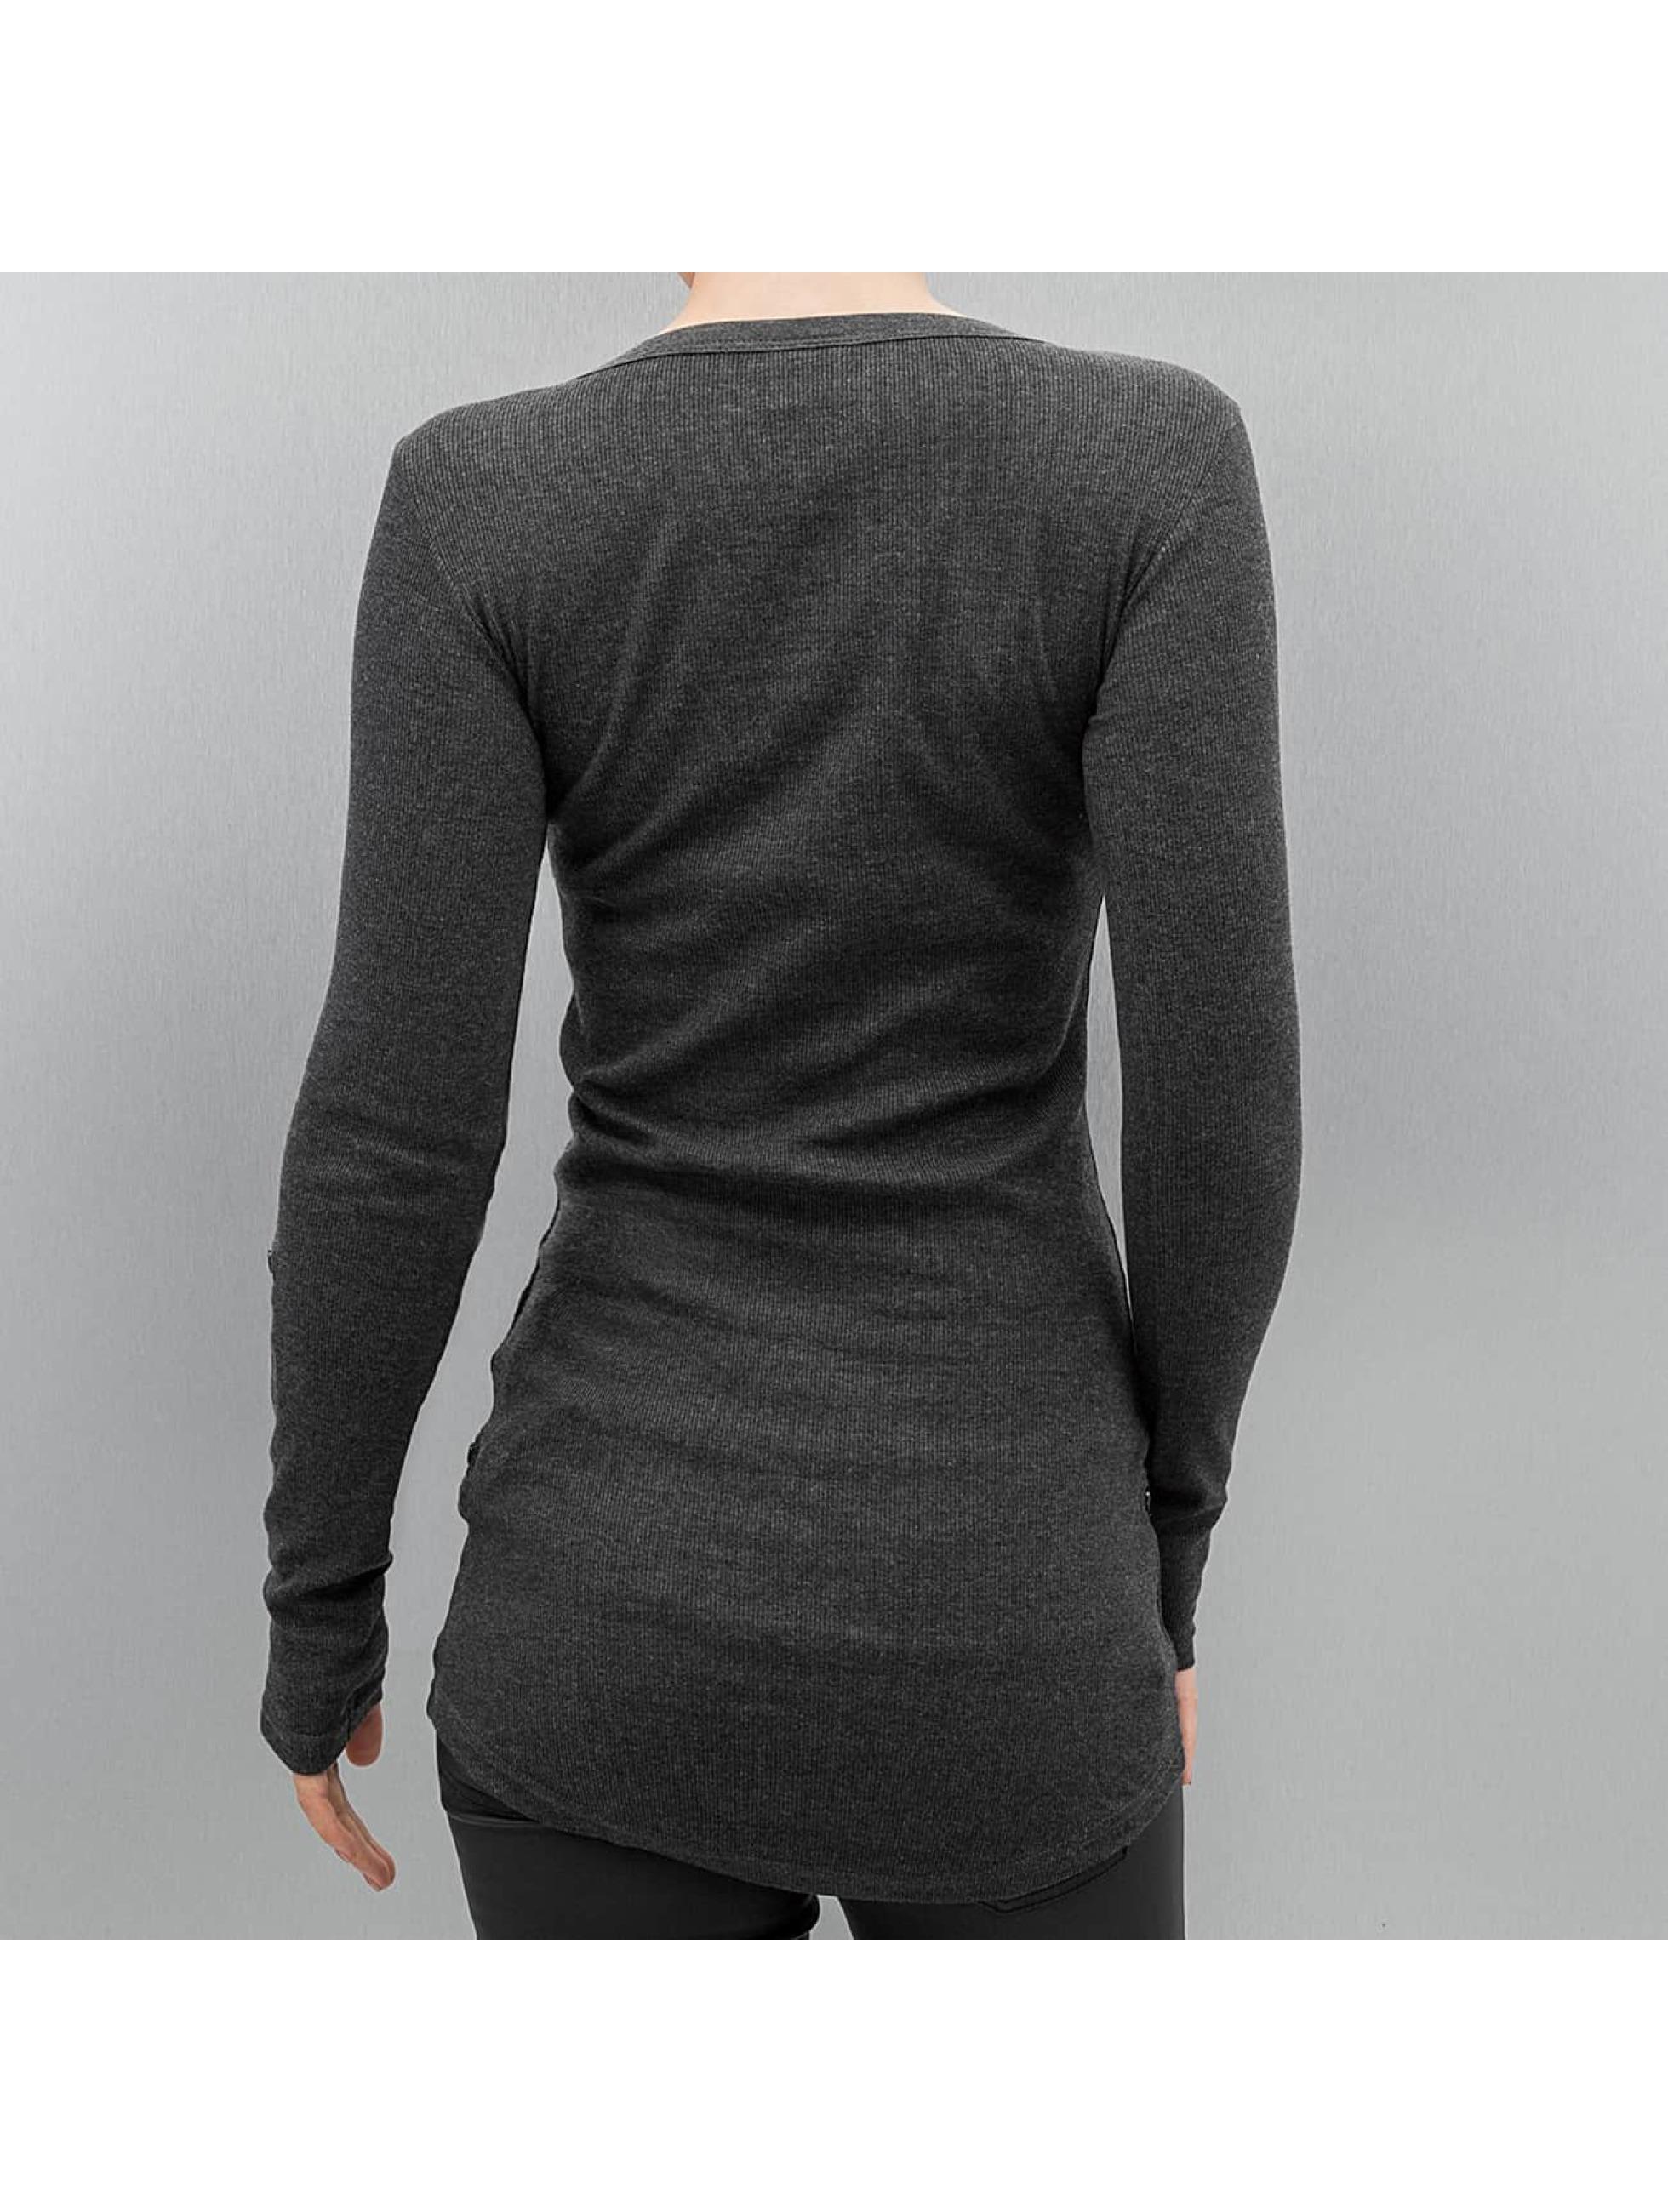 Urban Classics Pitkähihaiset paidat Long Rib Pocket Turnup harmaa